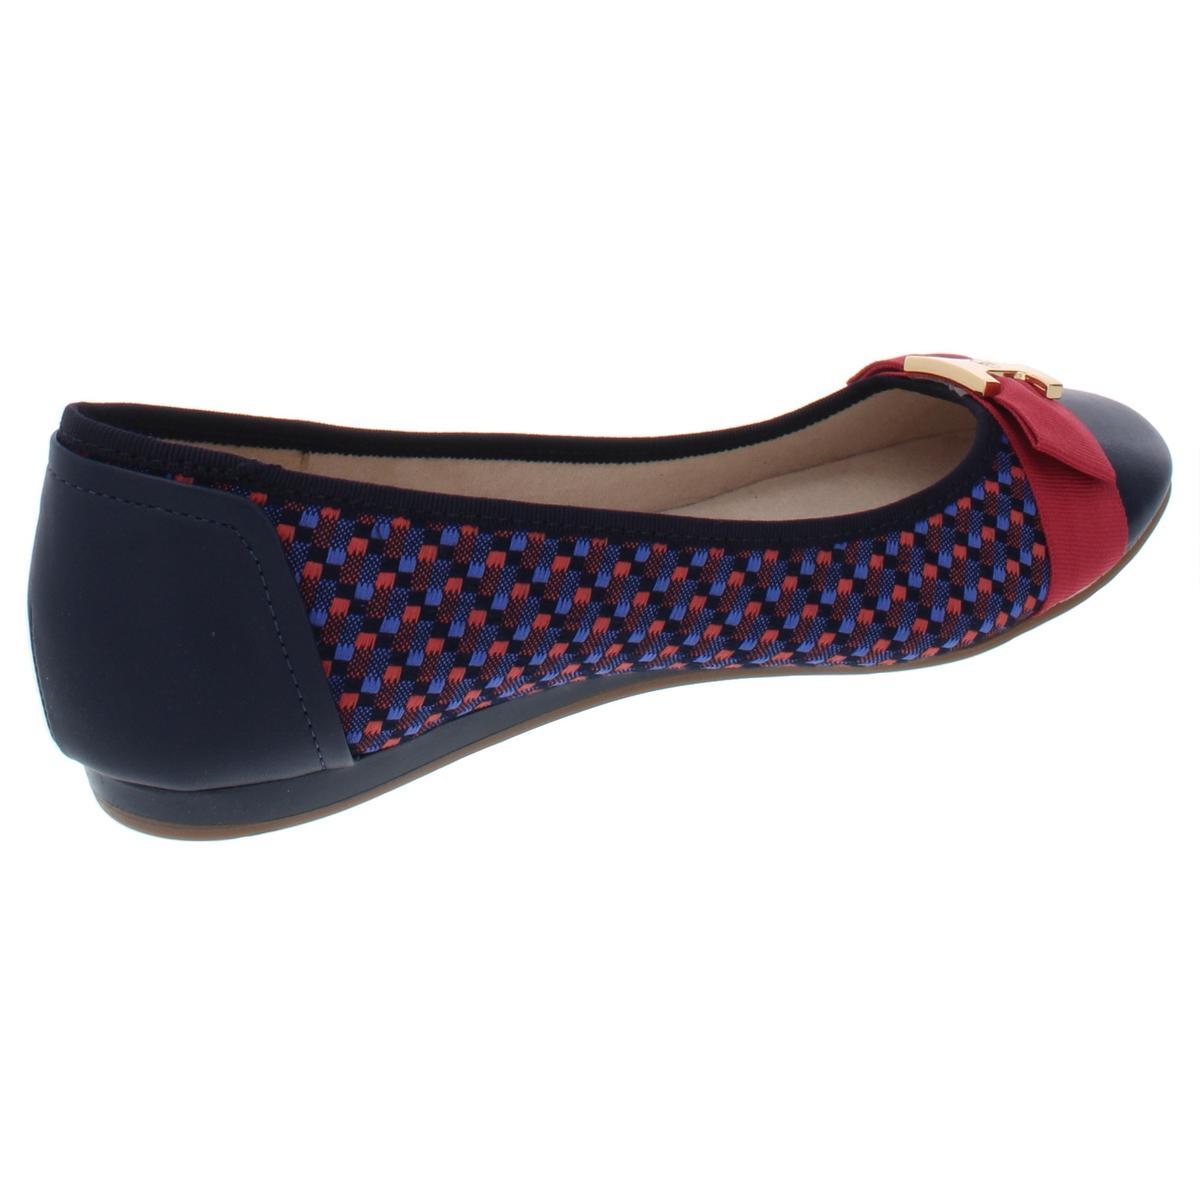 Charter Club Womens Pimmas Bow Slip On Ballet Flats Shoes BHFO 4389